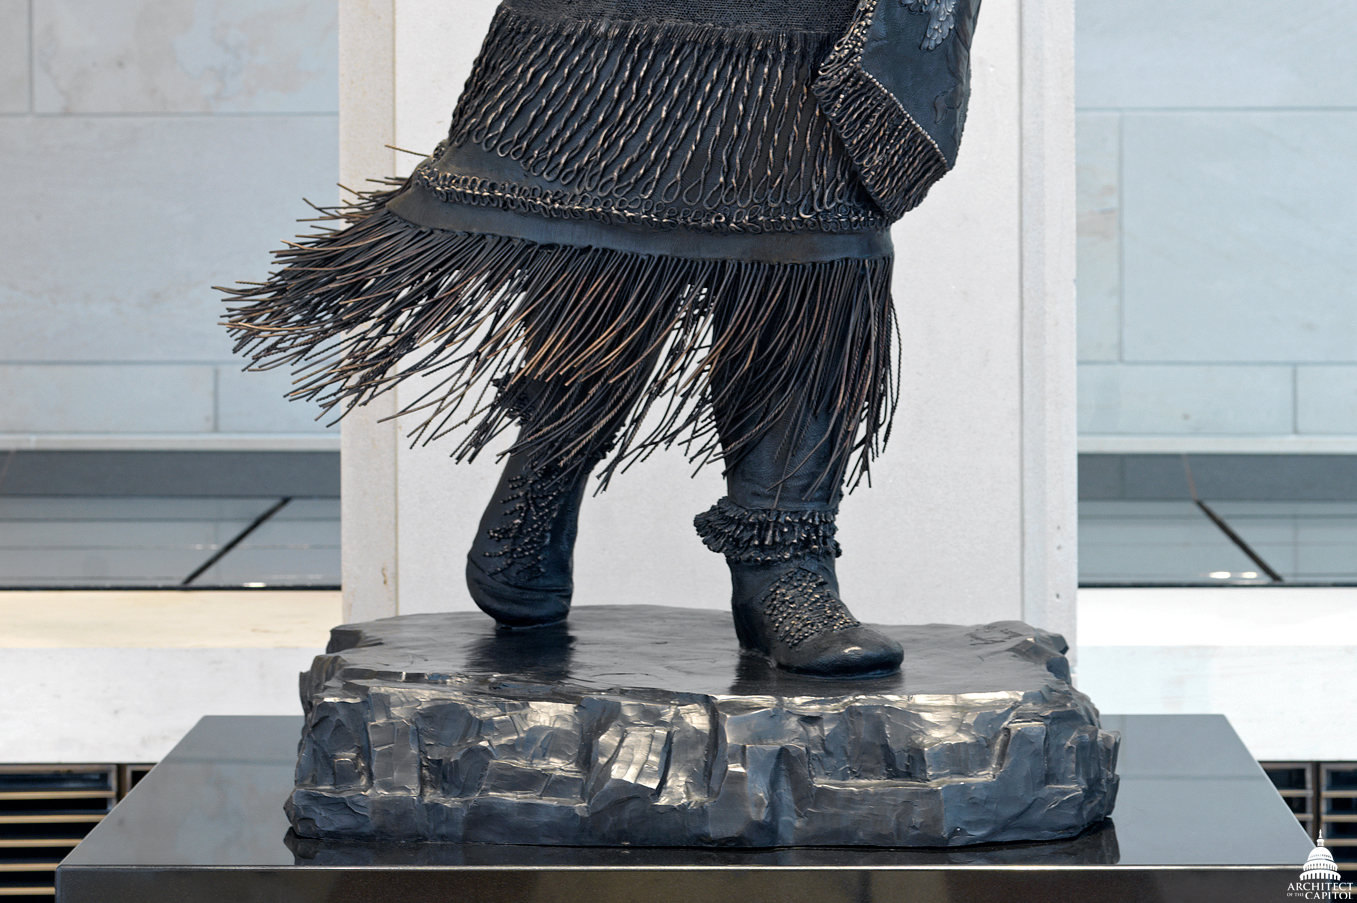 Detail of the dress of Sarah Winnemucca's statue.